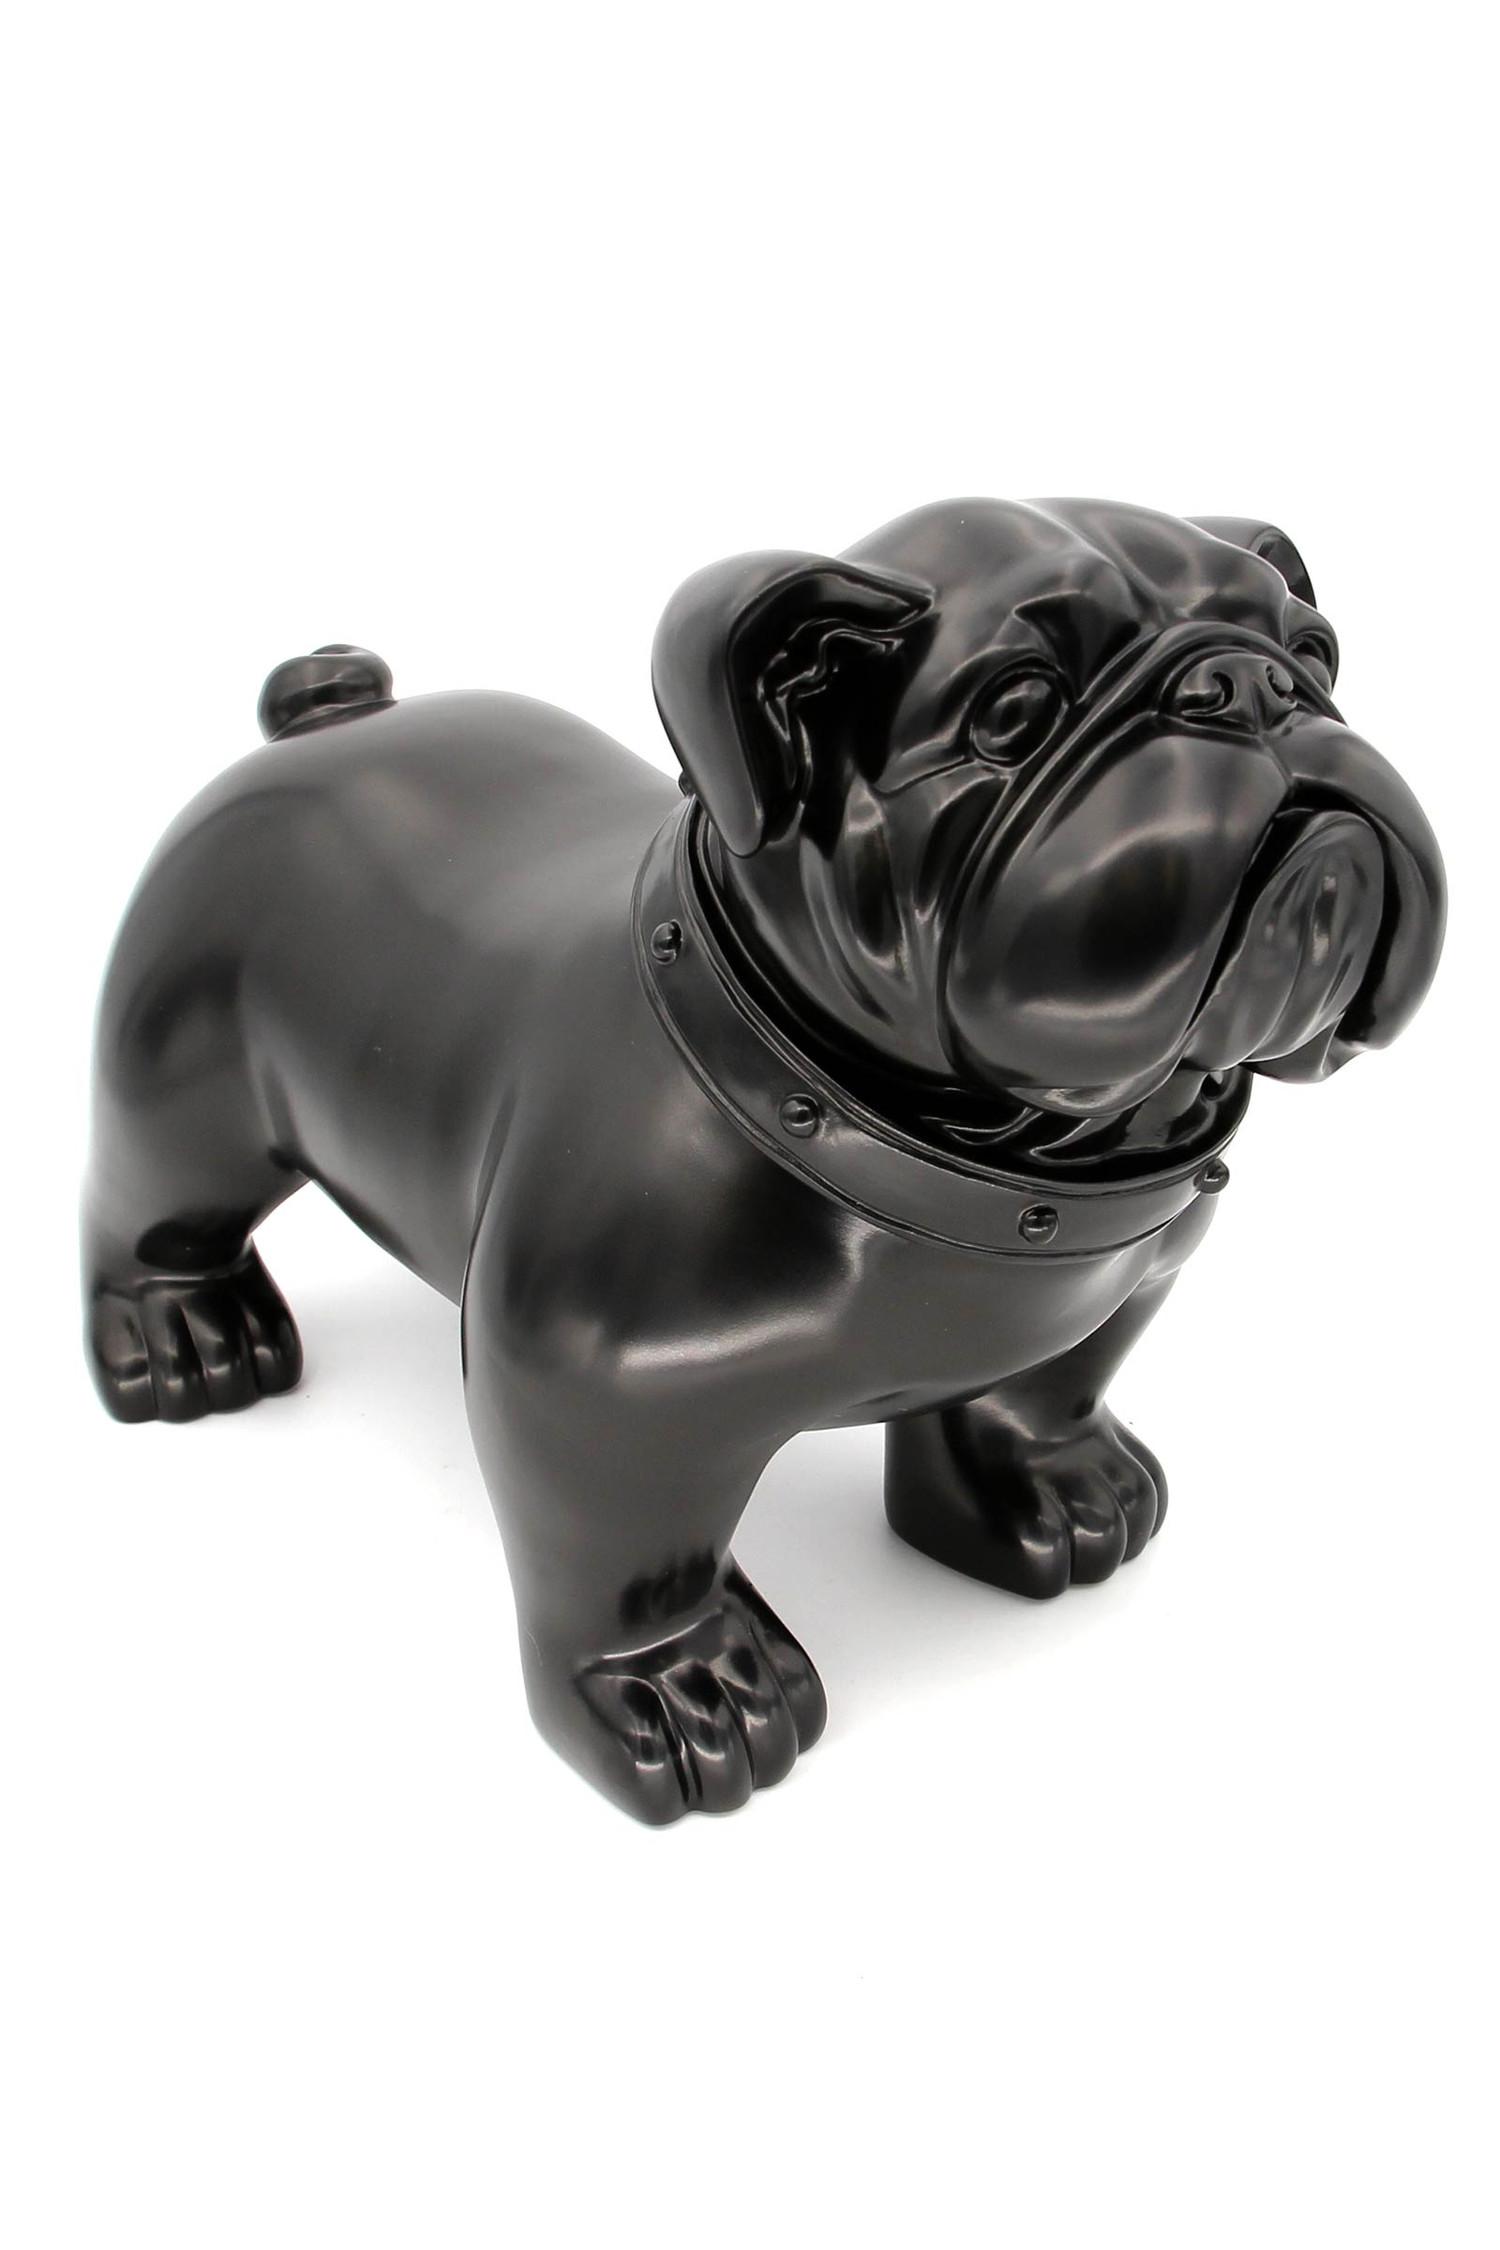 Black French Bulldog Life Like Model Effigy